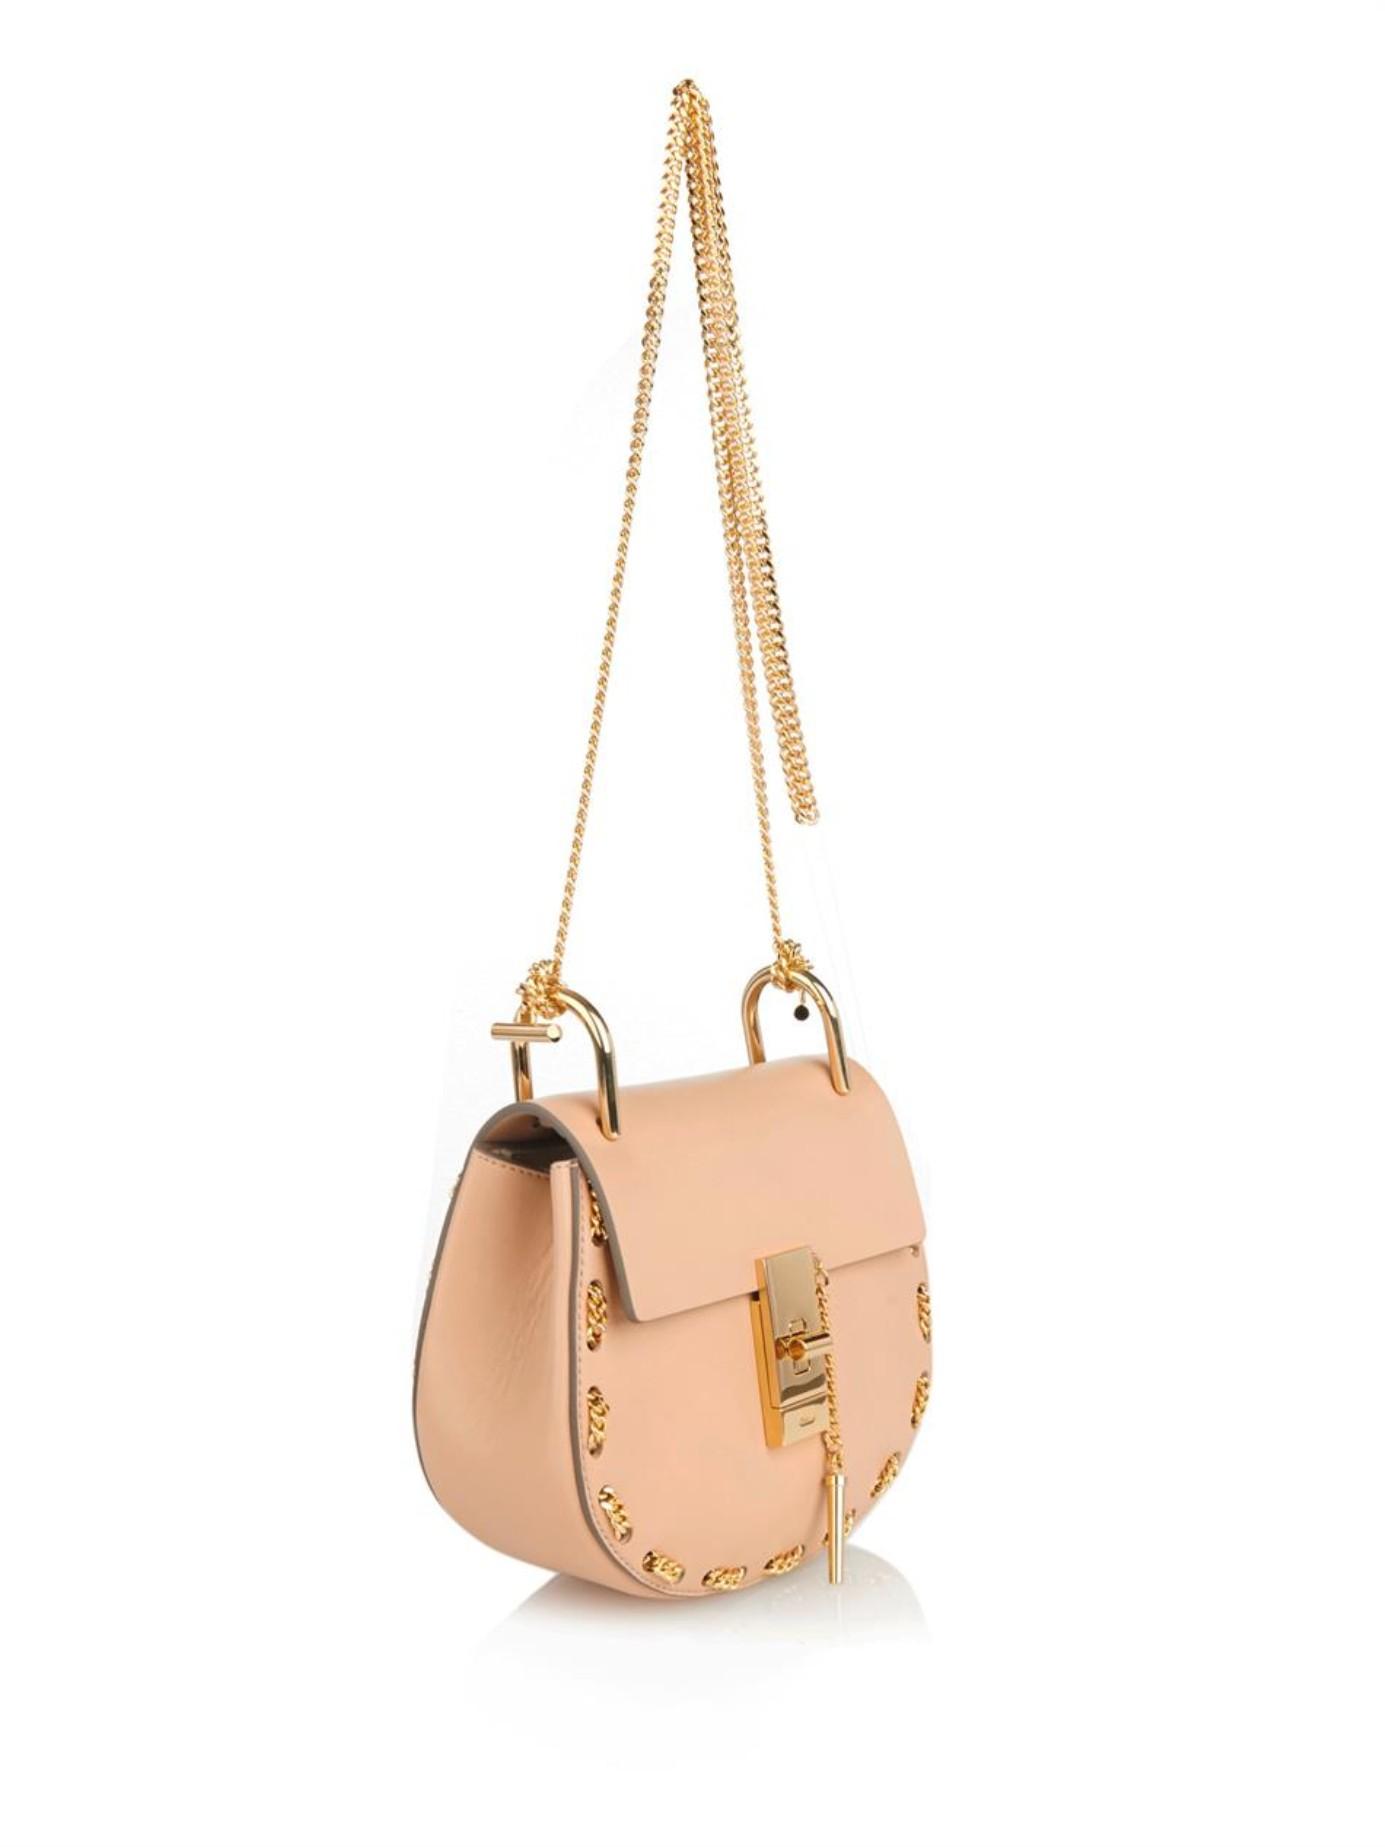 chloe handbags - chloe drew mini chain shoulder bag, cloe purse